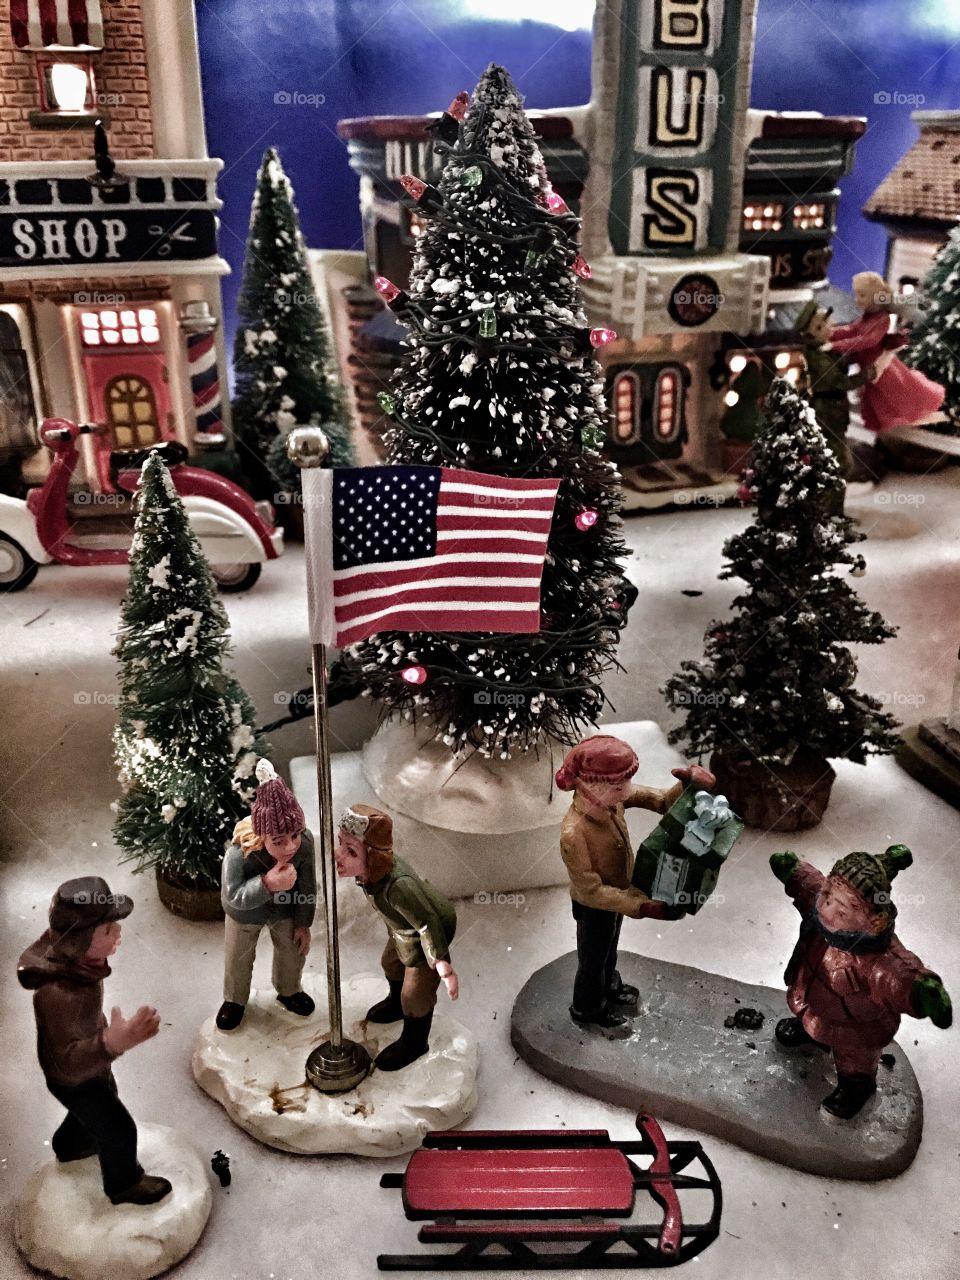 A Christmas store miniature.